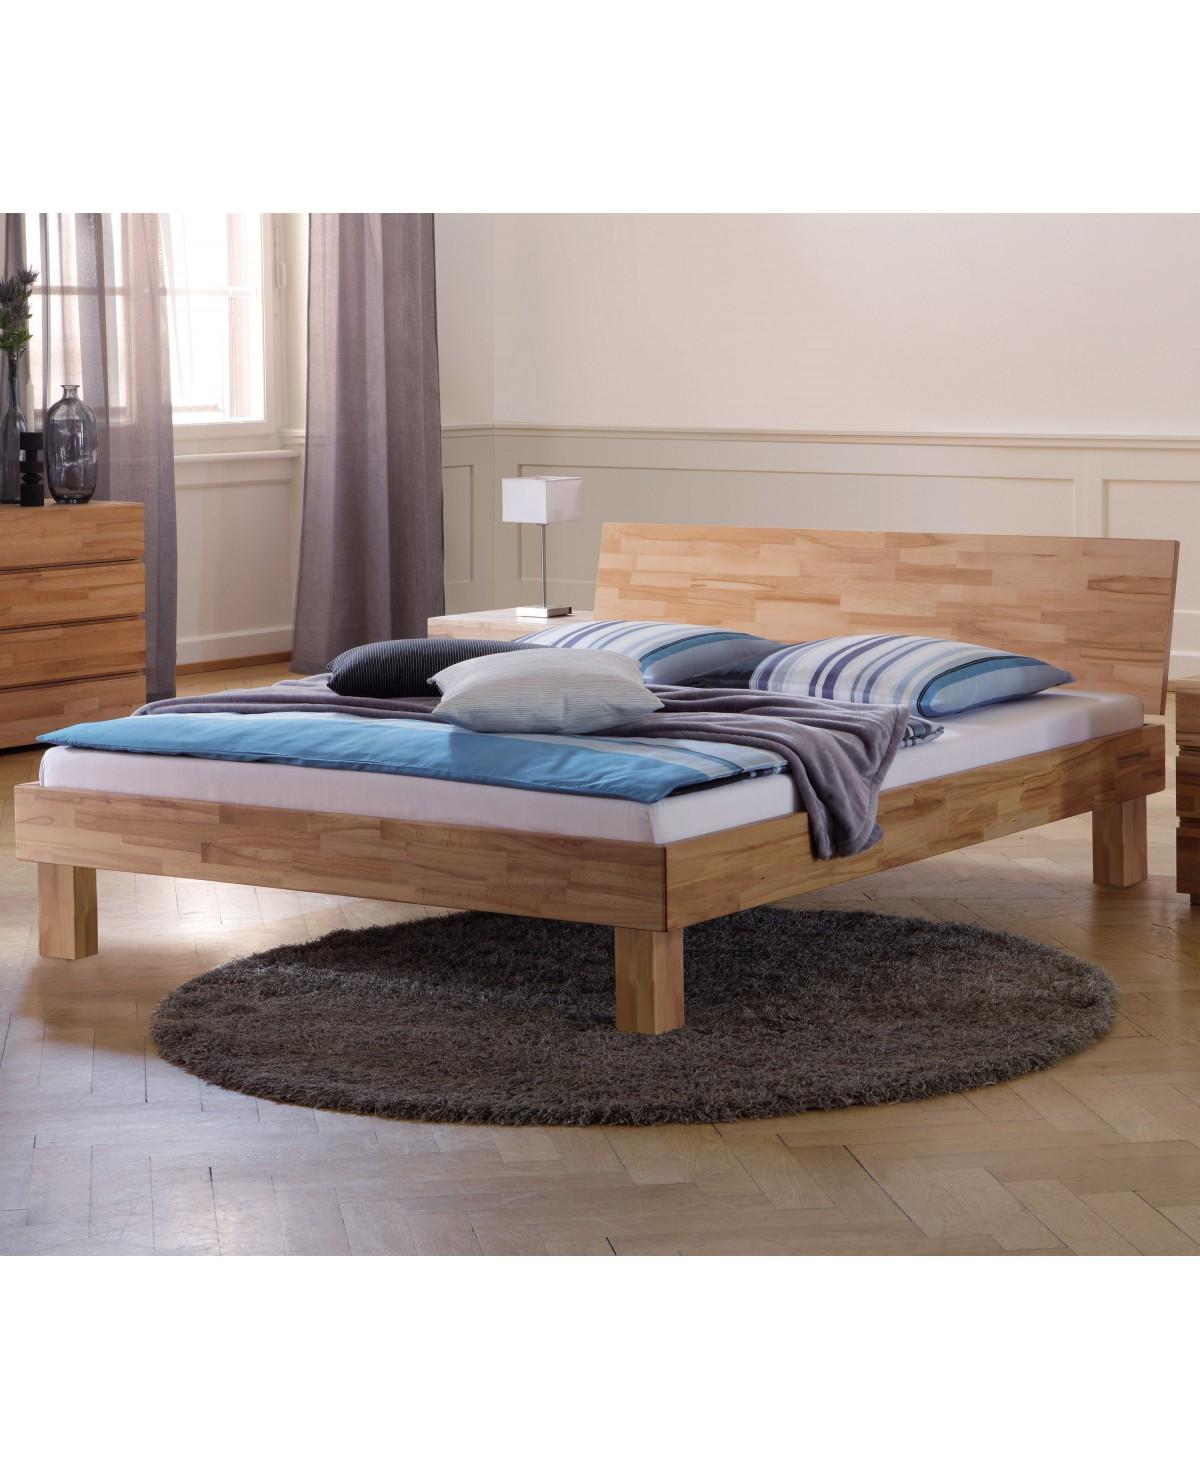 Full Size of Komplettbett 180x220 Hasena Wood Line Bett Kernbuche Kopfteil Varus Fe Cantu 20 Wohnzimmer Komplettbett 180x220